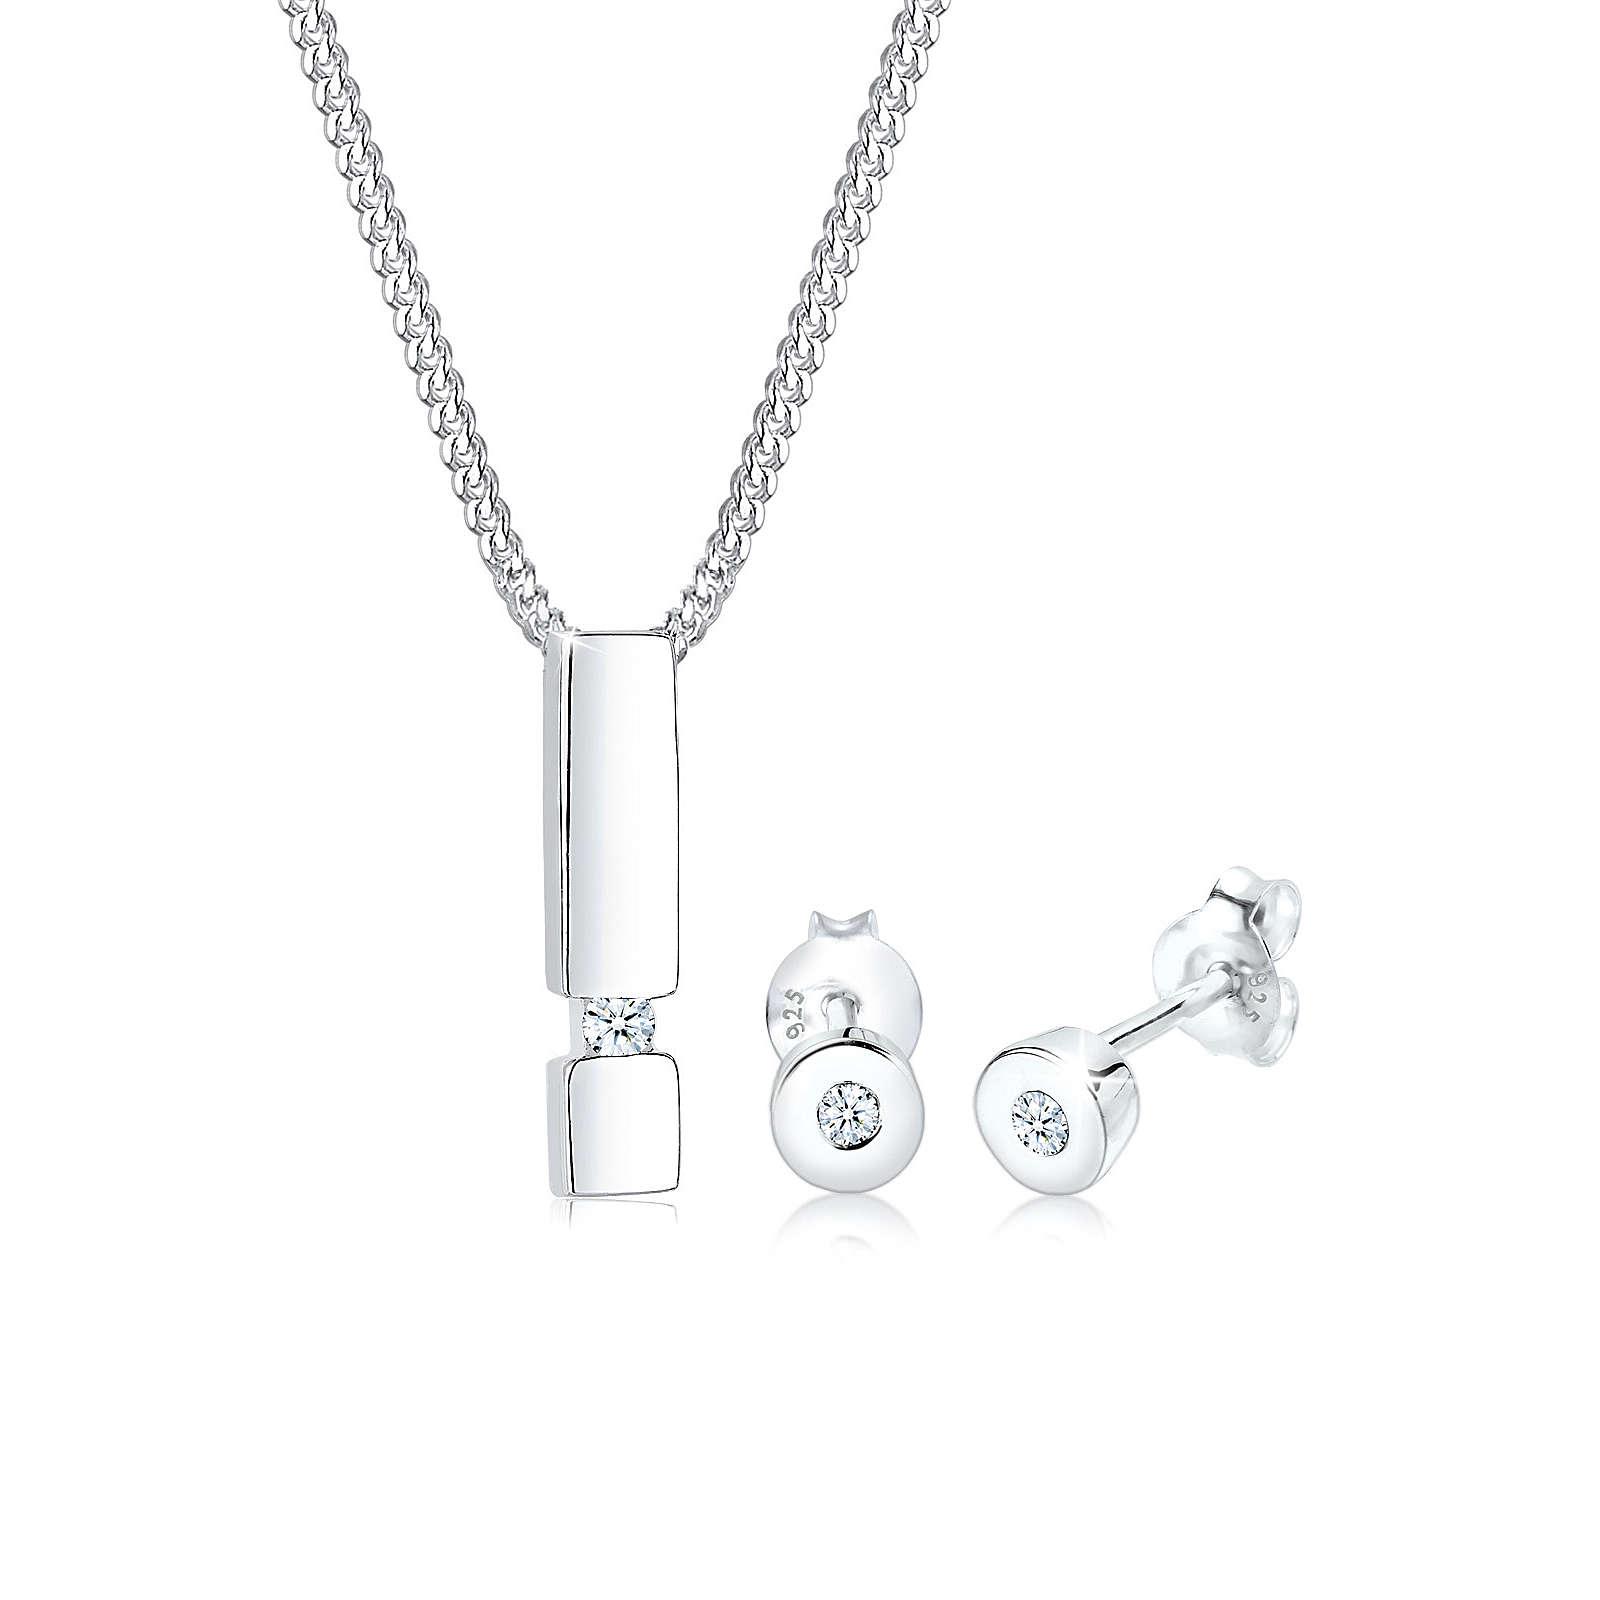 Diamore Halskette silber Damen Gr. one size